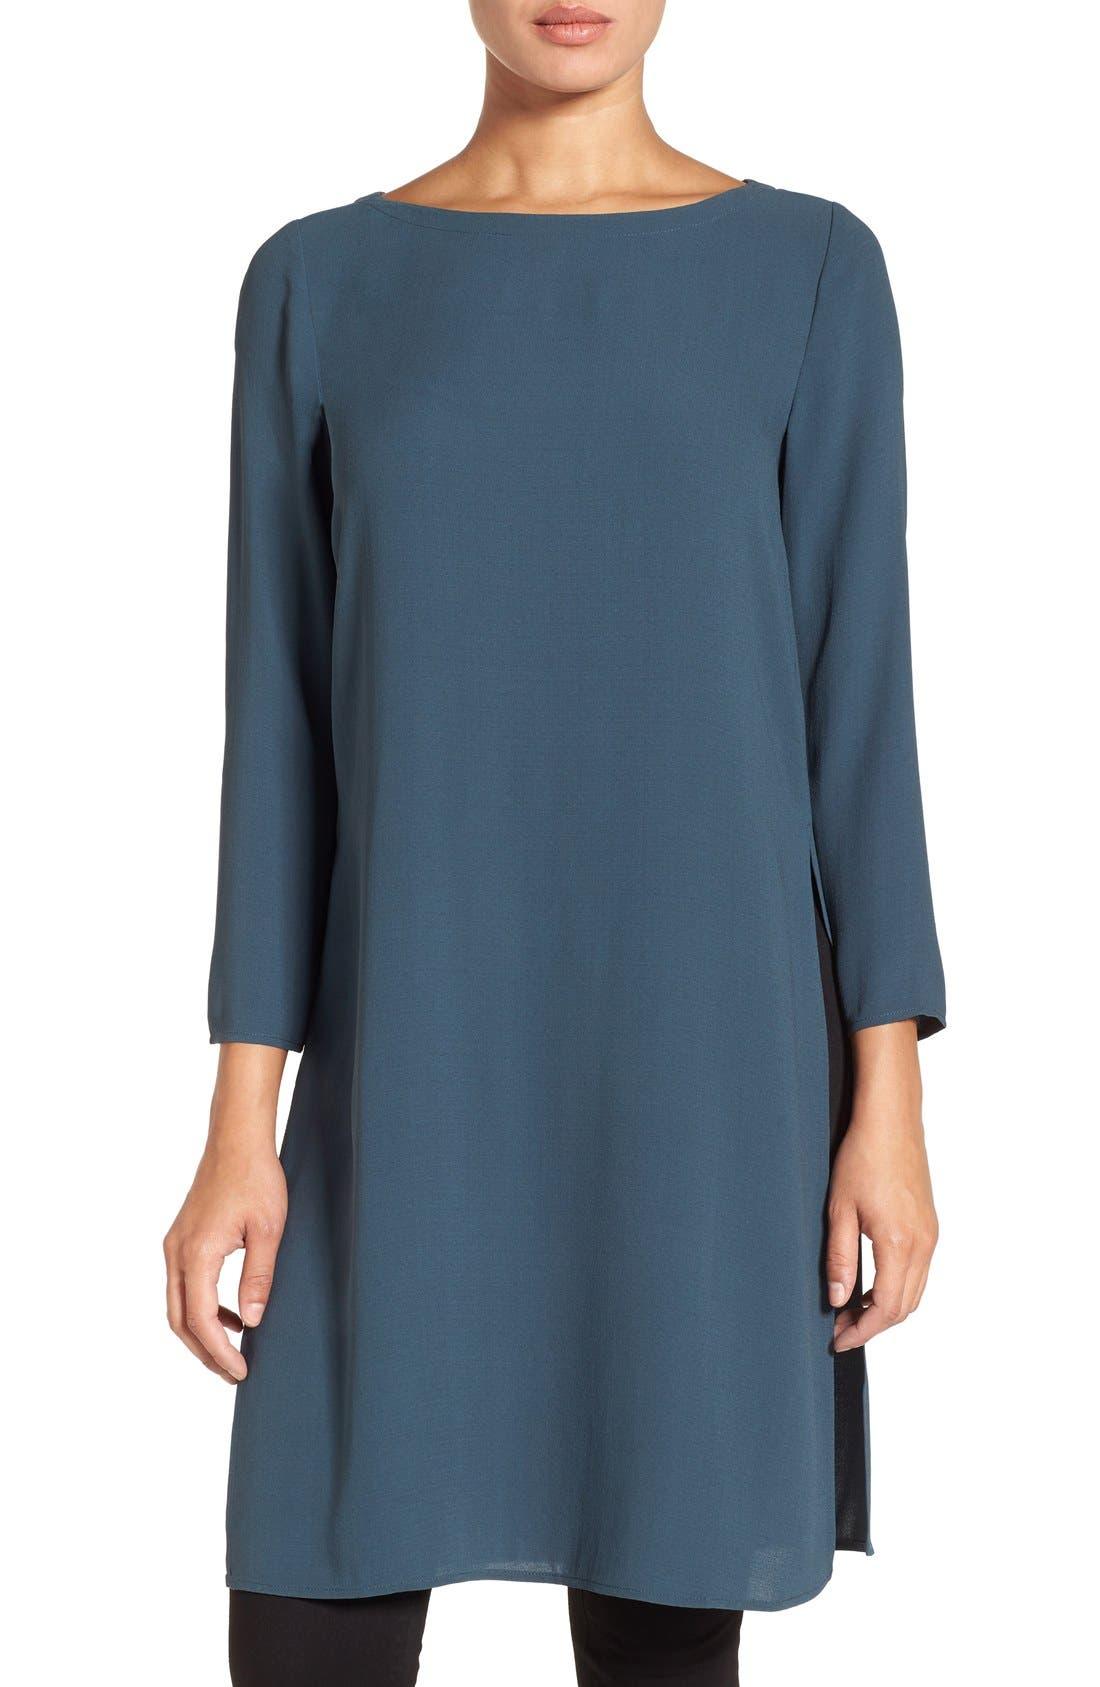 Alternate Image 1 Selected - Eileen Fisher Bateau Neck Silk Crepe Tunic (Regular & Petite)